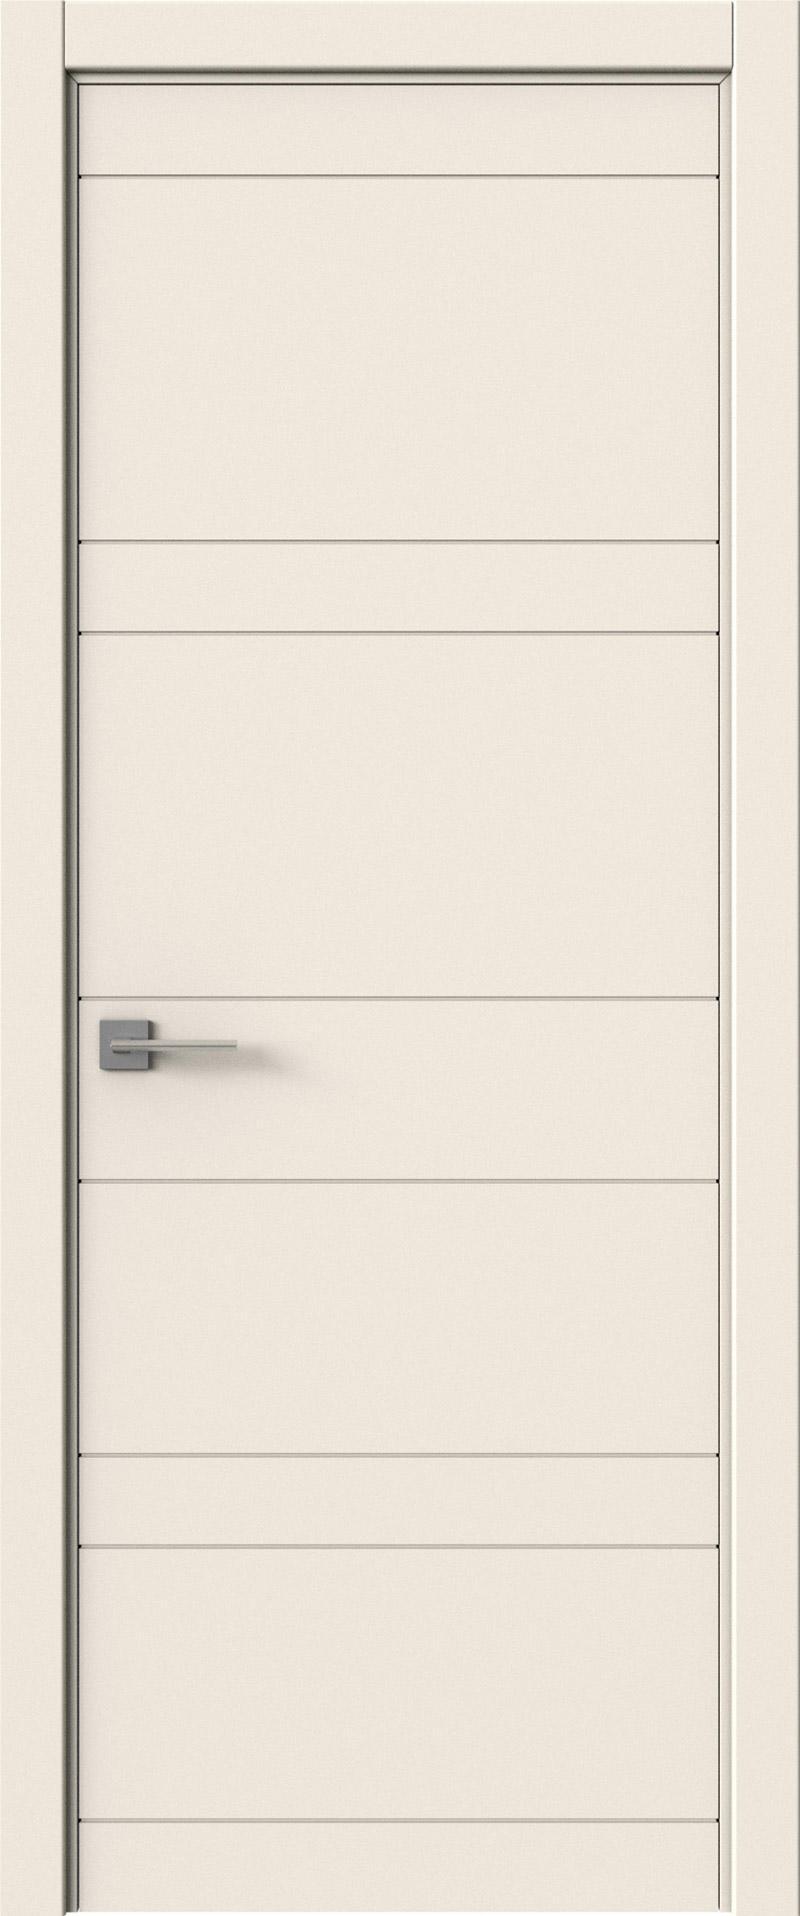 Tivoli Е-2 цвет - Бежевая эмаль (RAL 9010) Без стекла (ДГ)